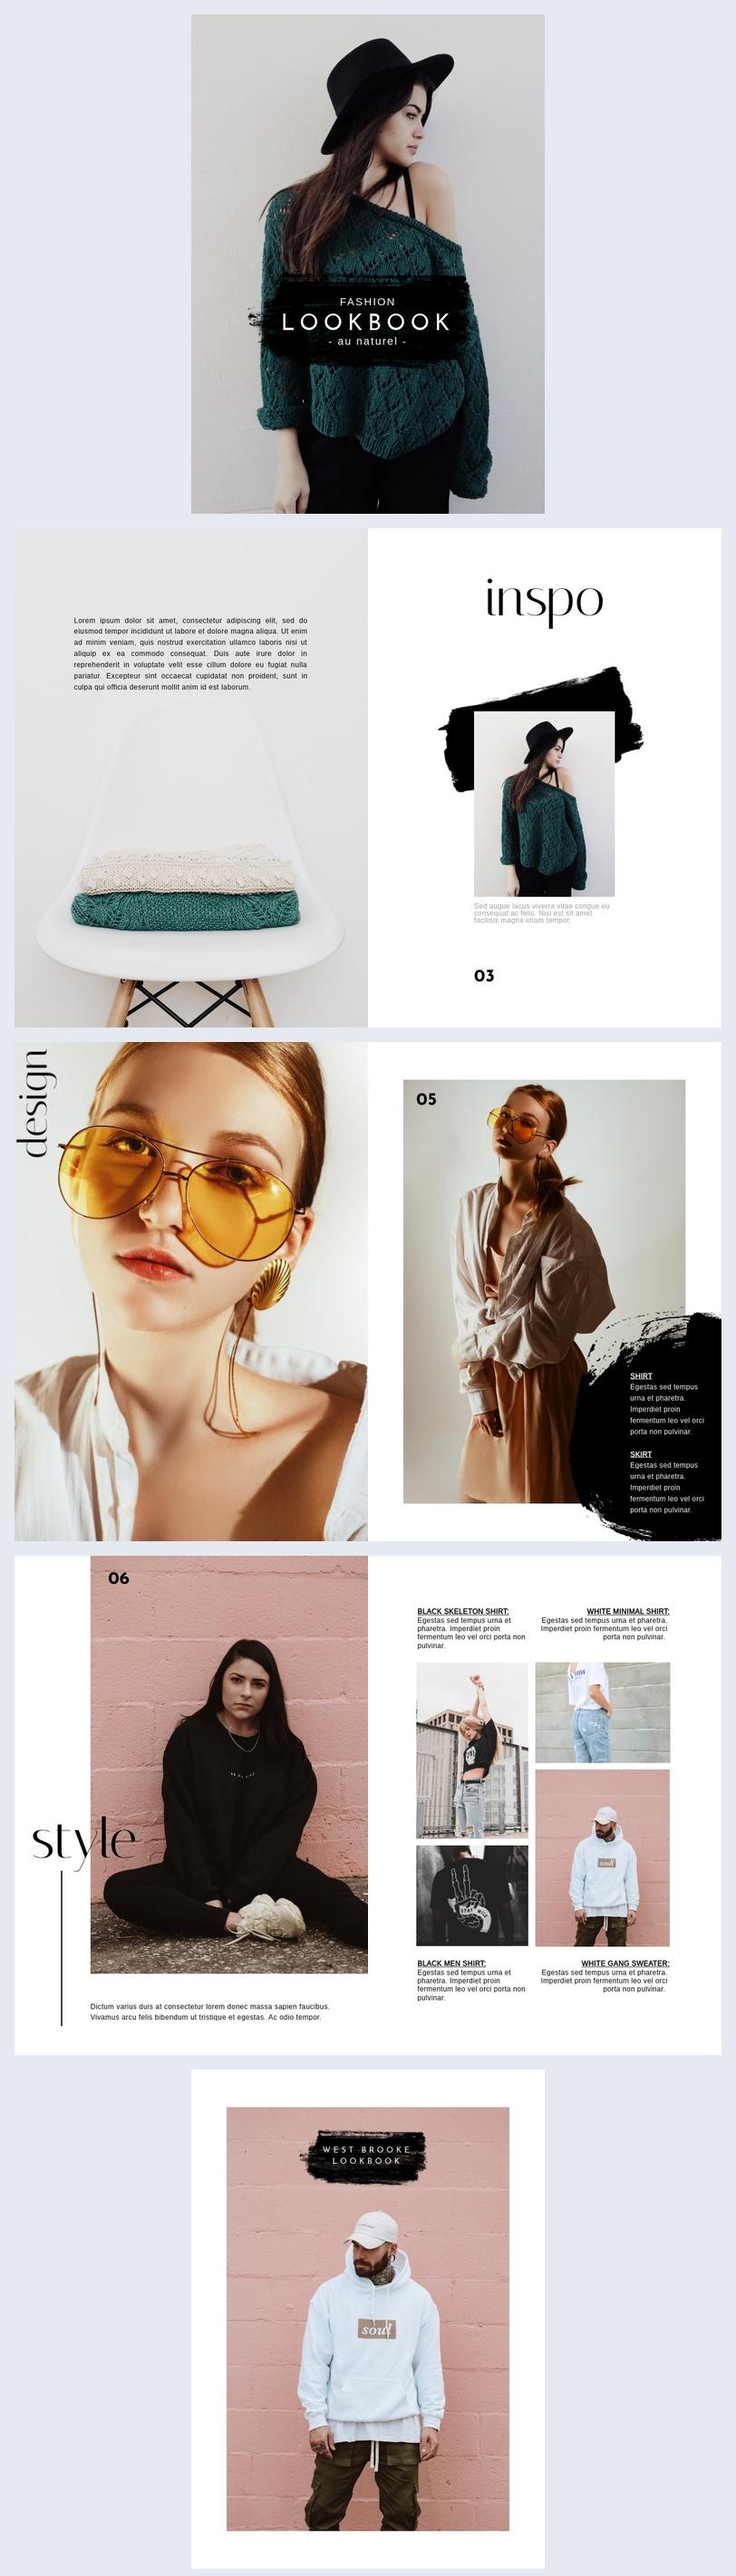 Lookbook & Fashion Portfolio Template